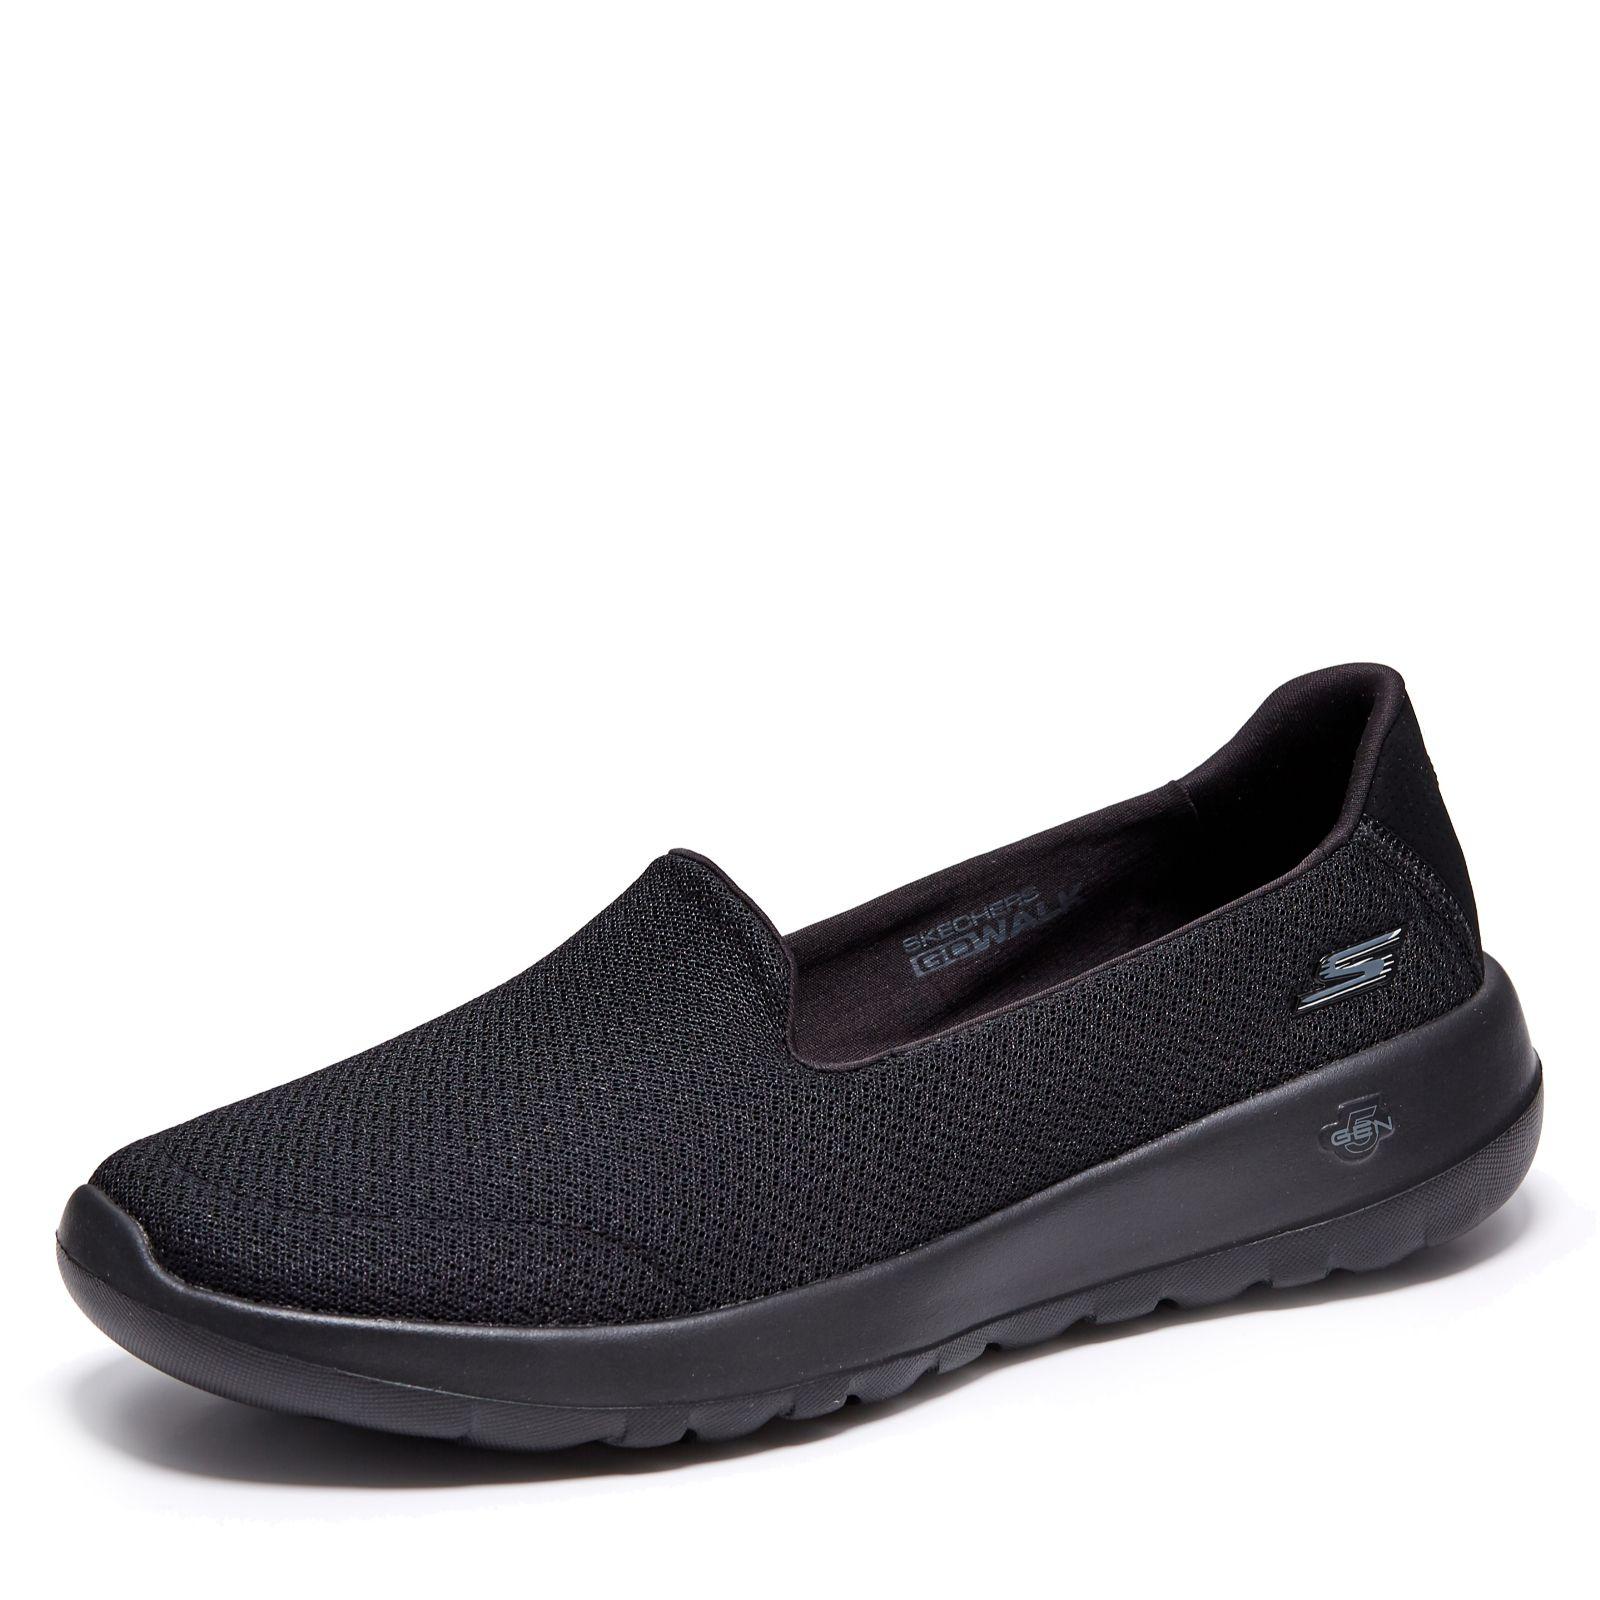 ed62299ce70 Skechers GOwalk Joy Slip On Shoe with GOGA MAX Insole - QVC UK